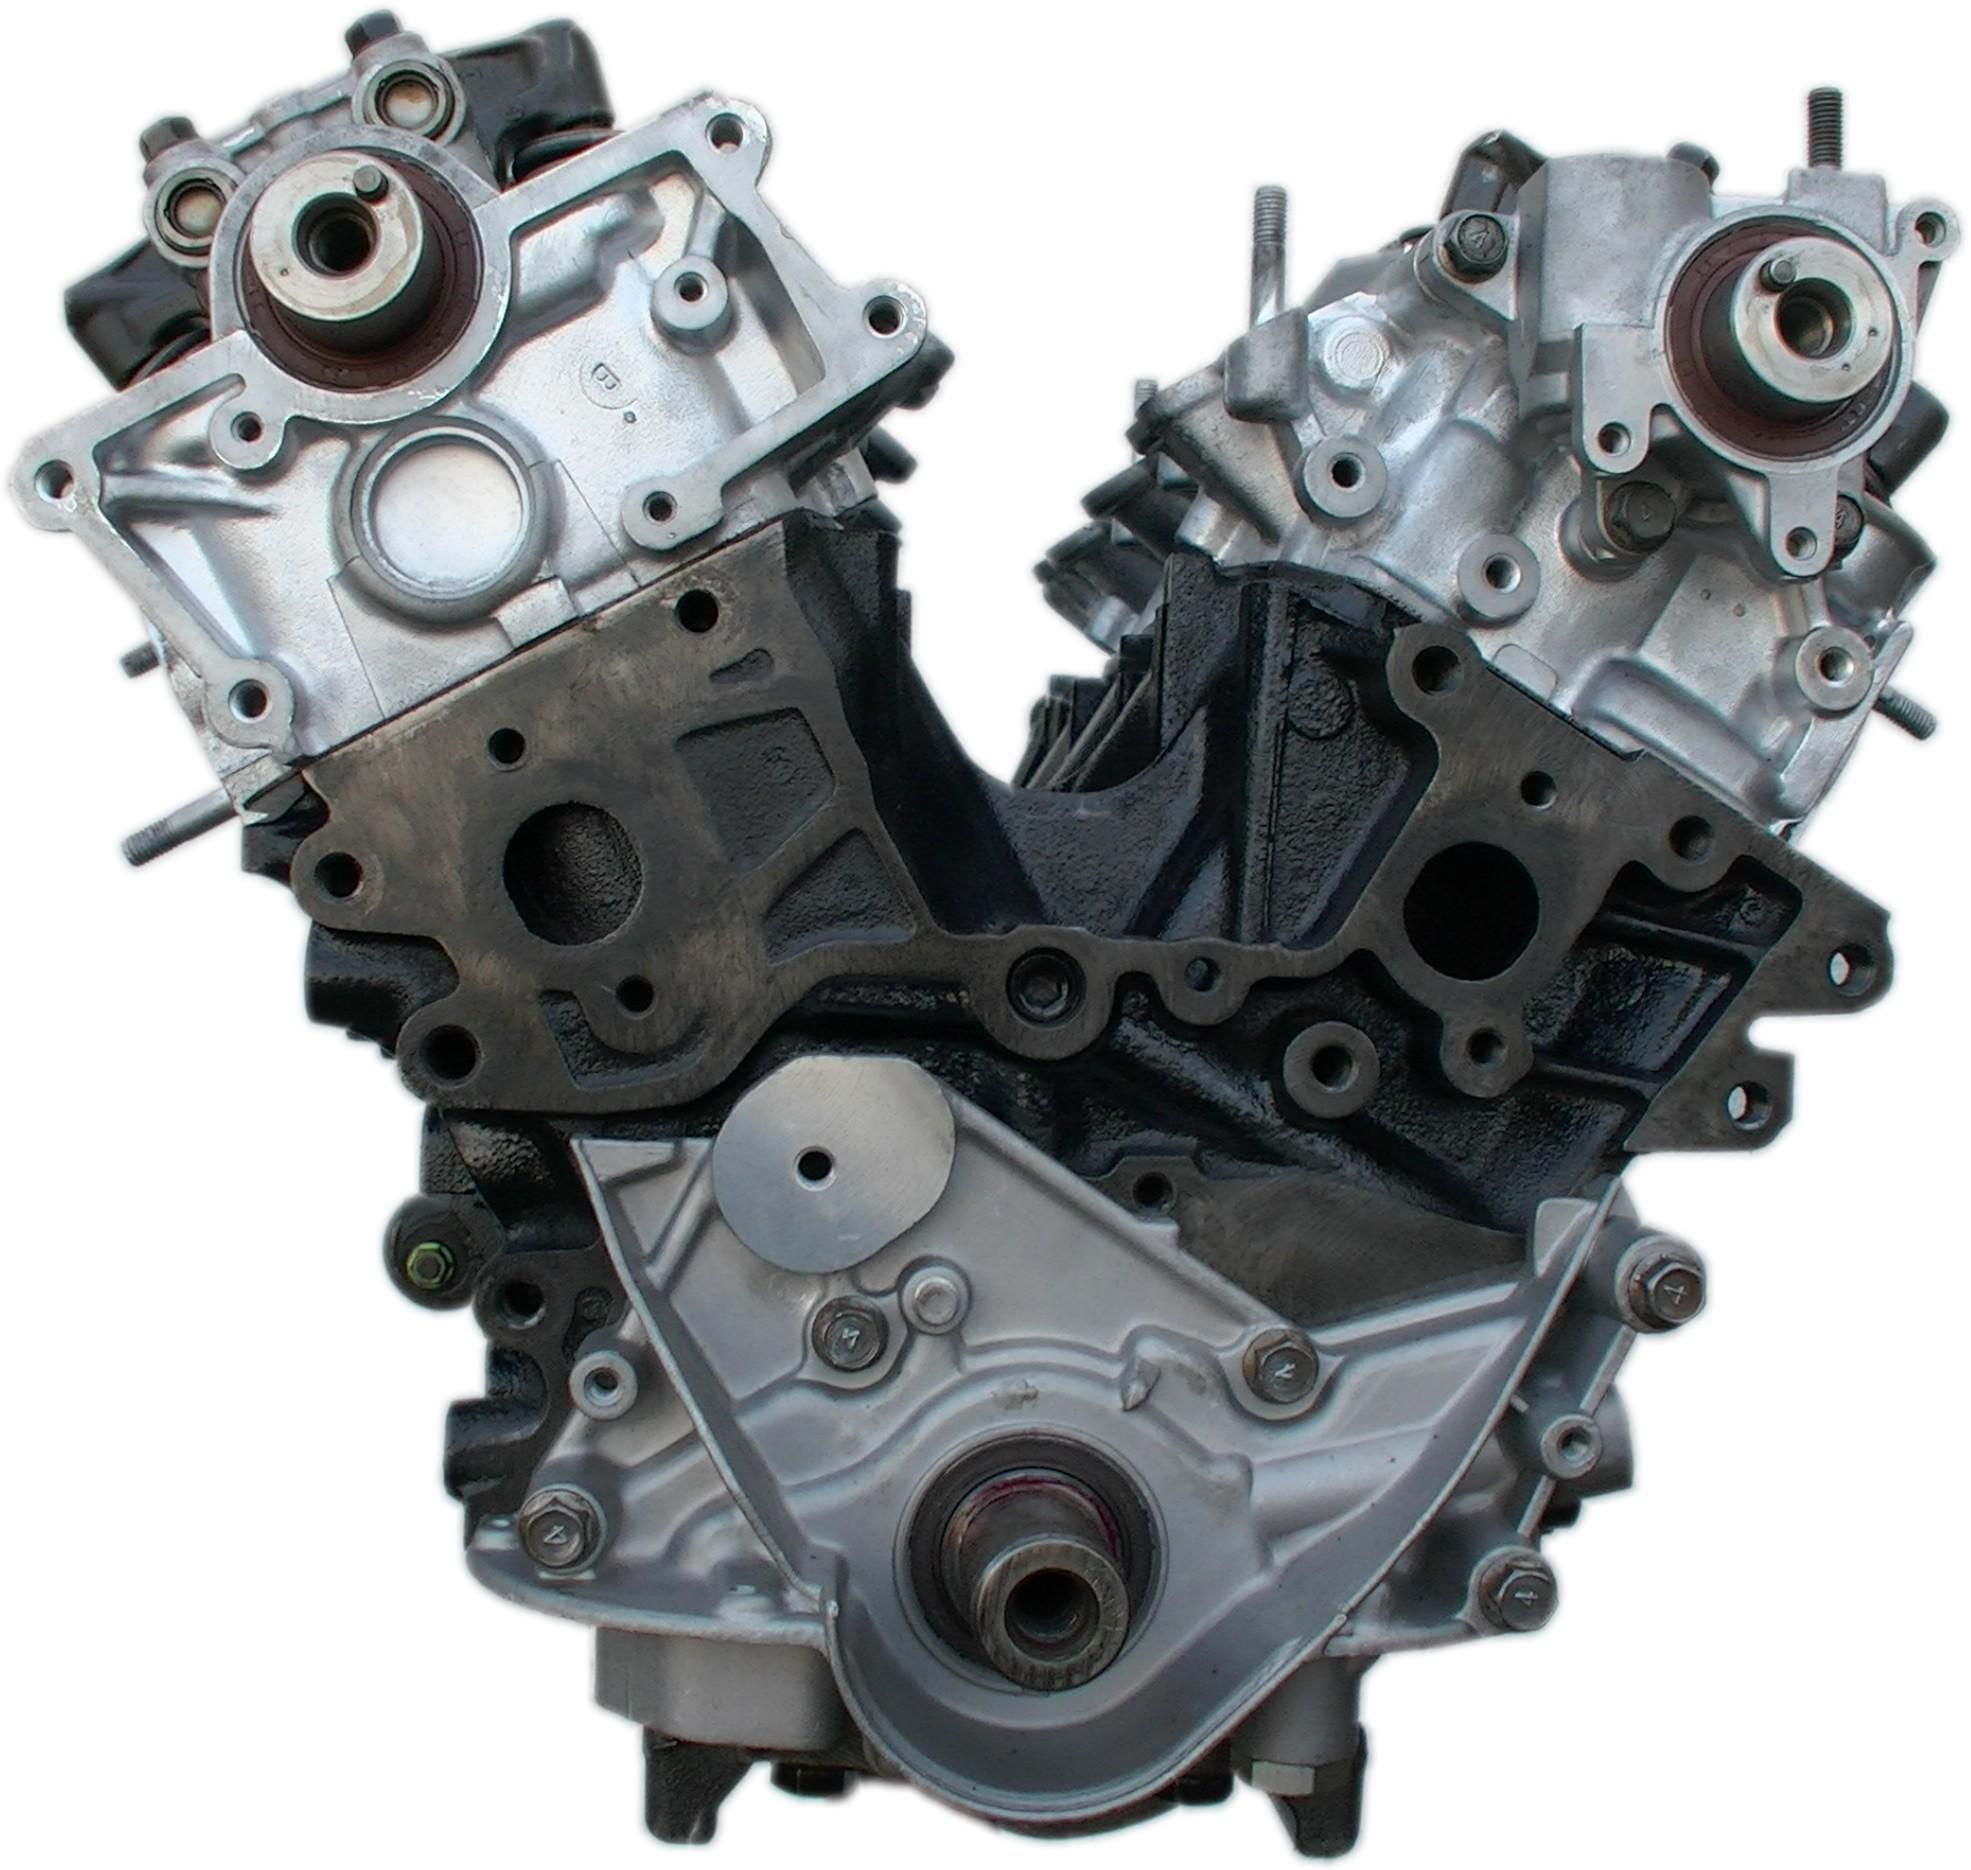 chrysler 3 0l v6 engine diagram chrysler 3.0 engine diagram - wiring diagram #1